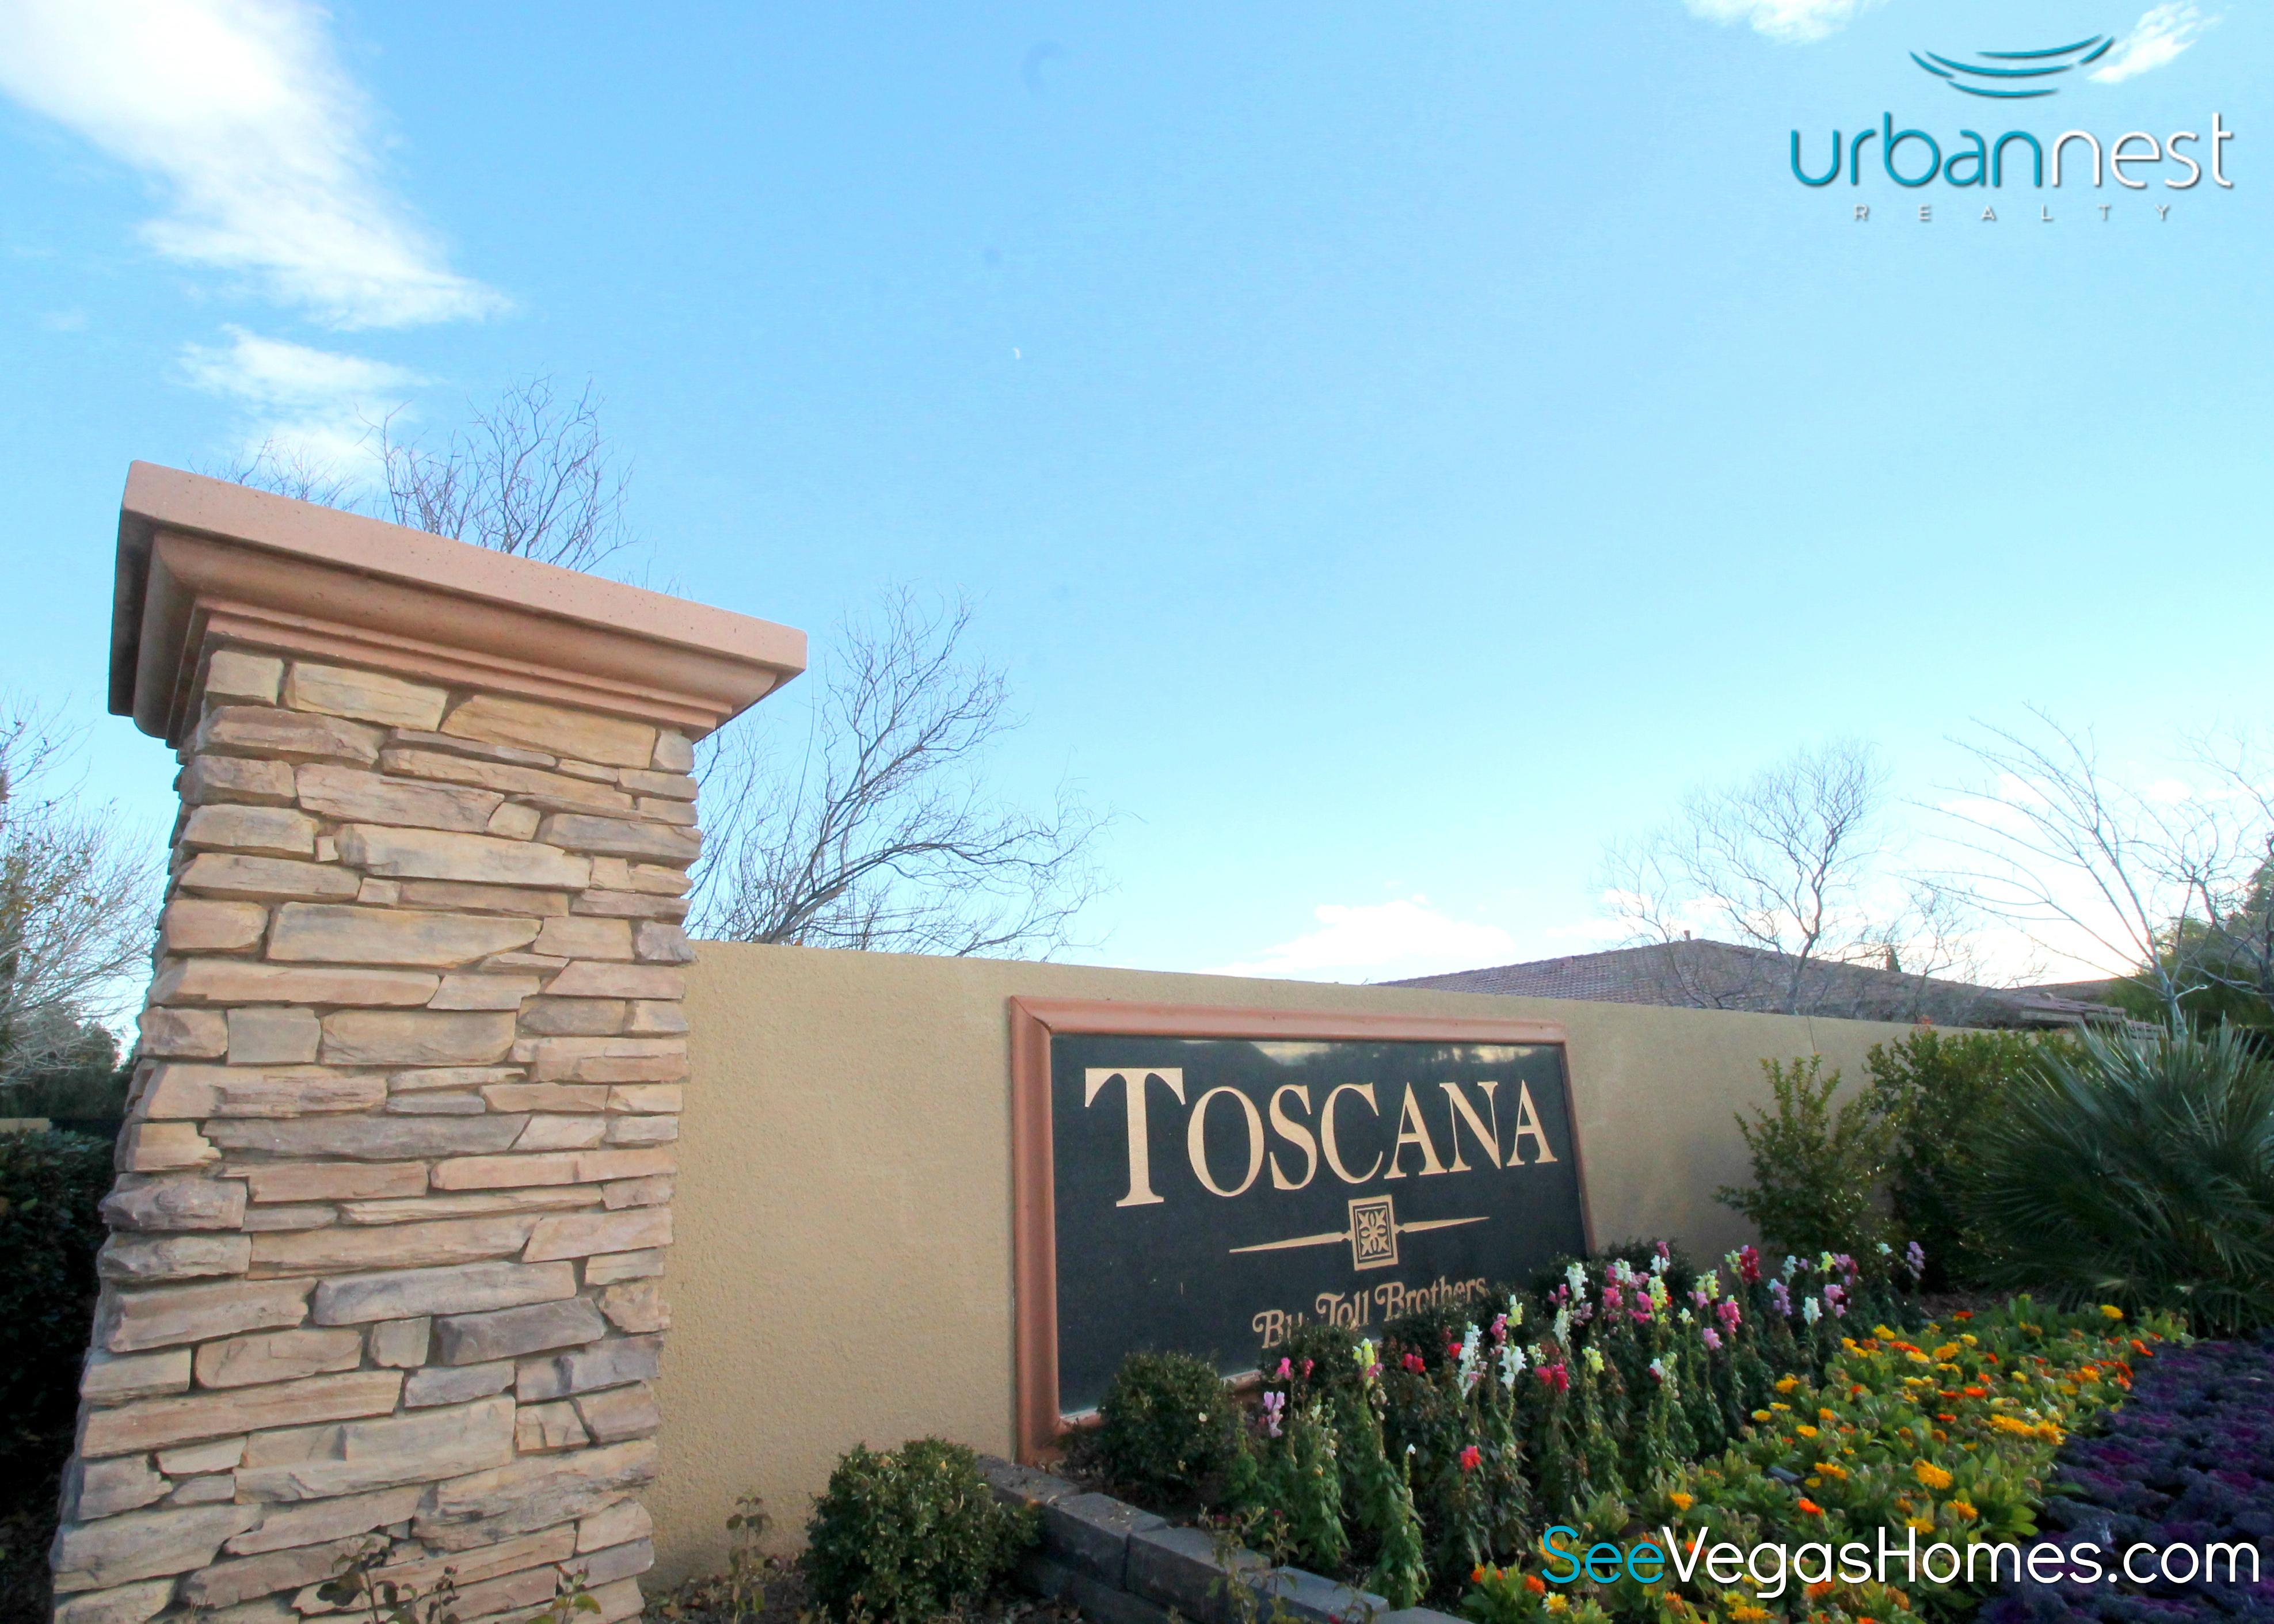 Toscana Bella Vista Toll Brothers Las Vegas NV 89131 SeeVegasHomes